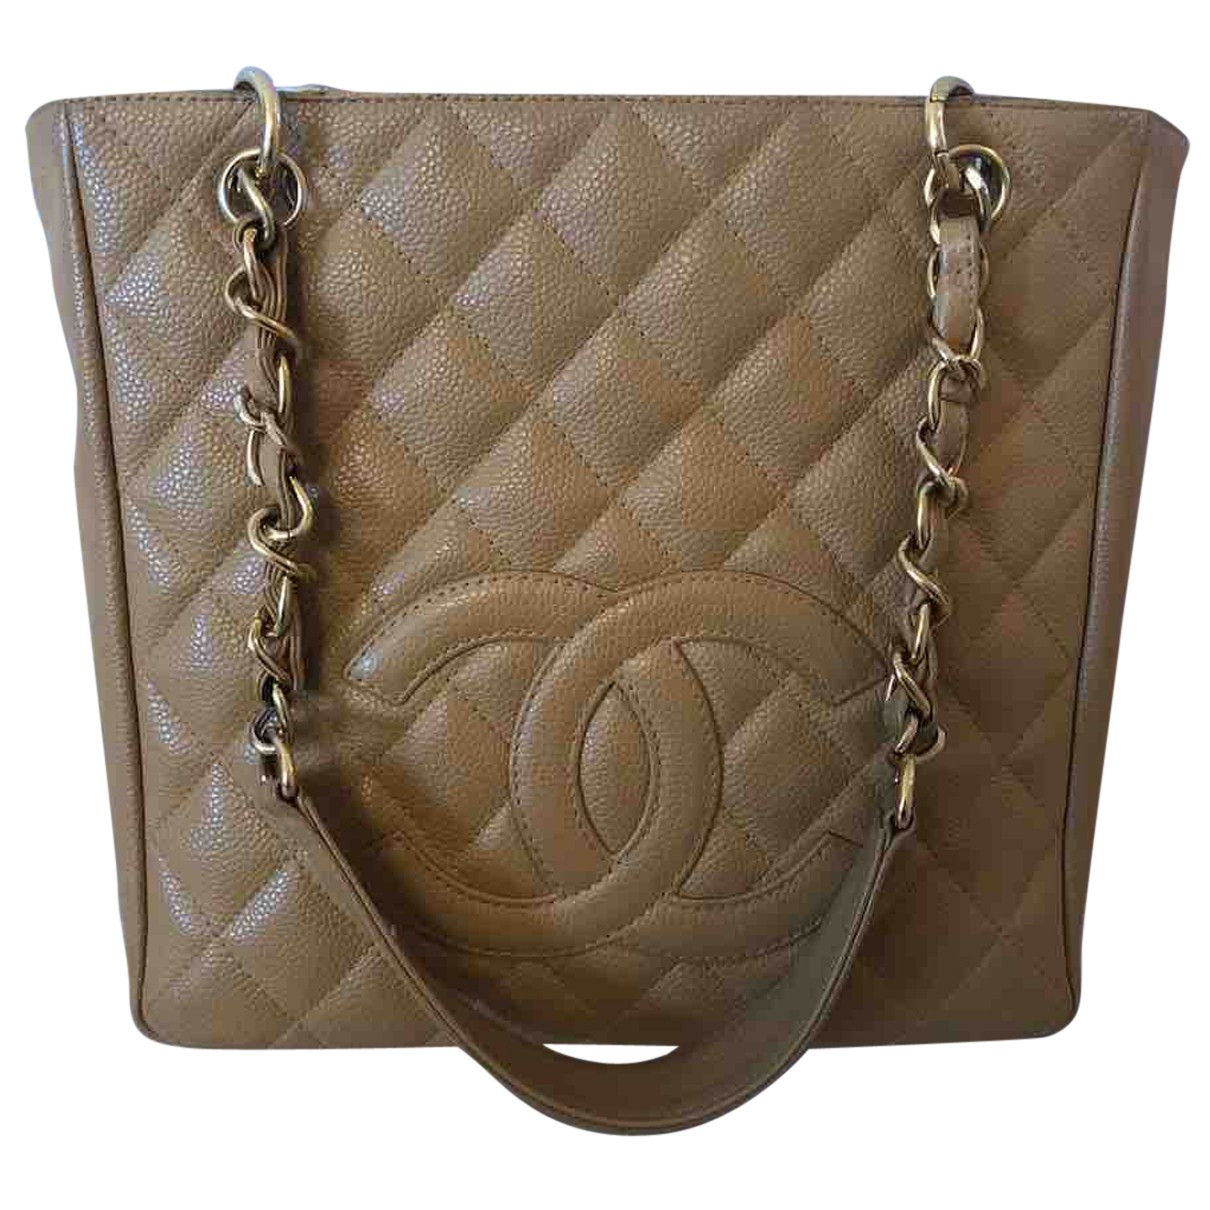 Chanel - Sac a main Petite Shopping Tote pour femme en cuir - beige